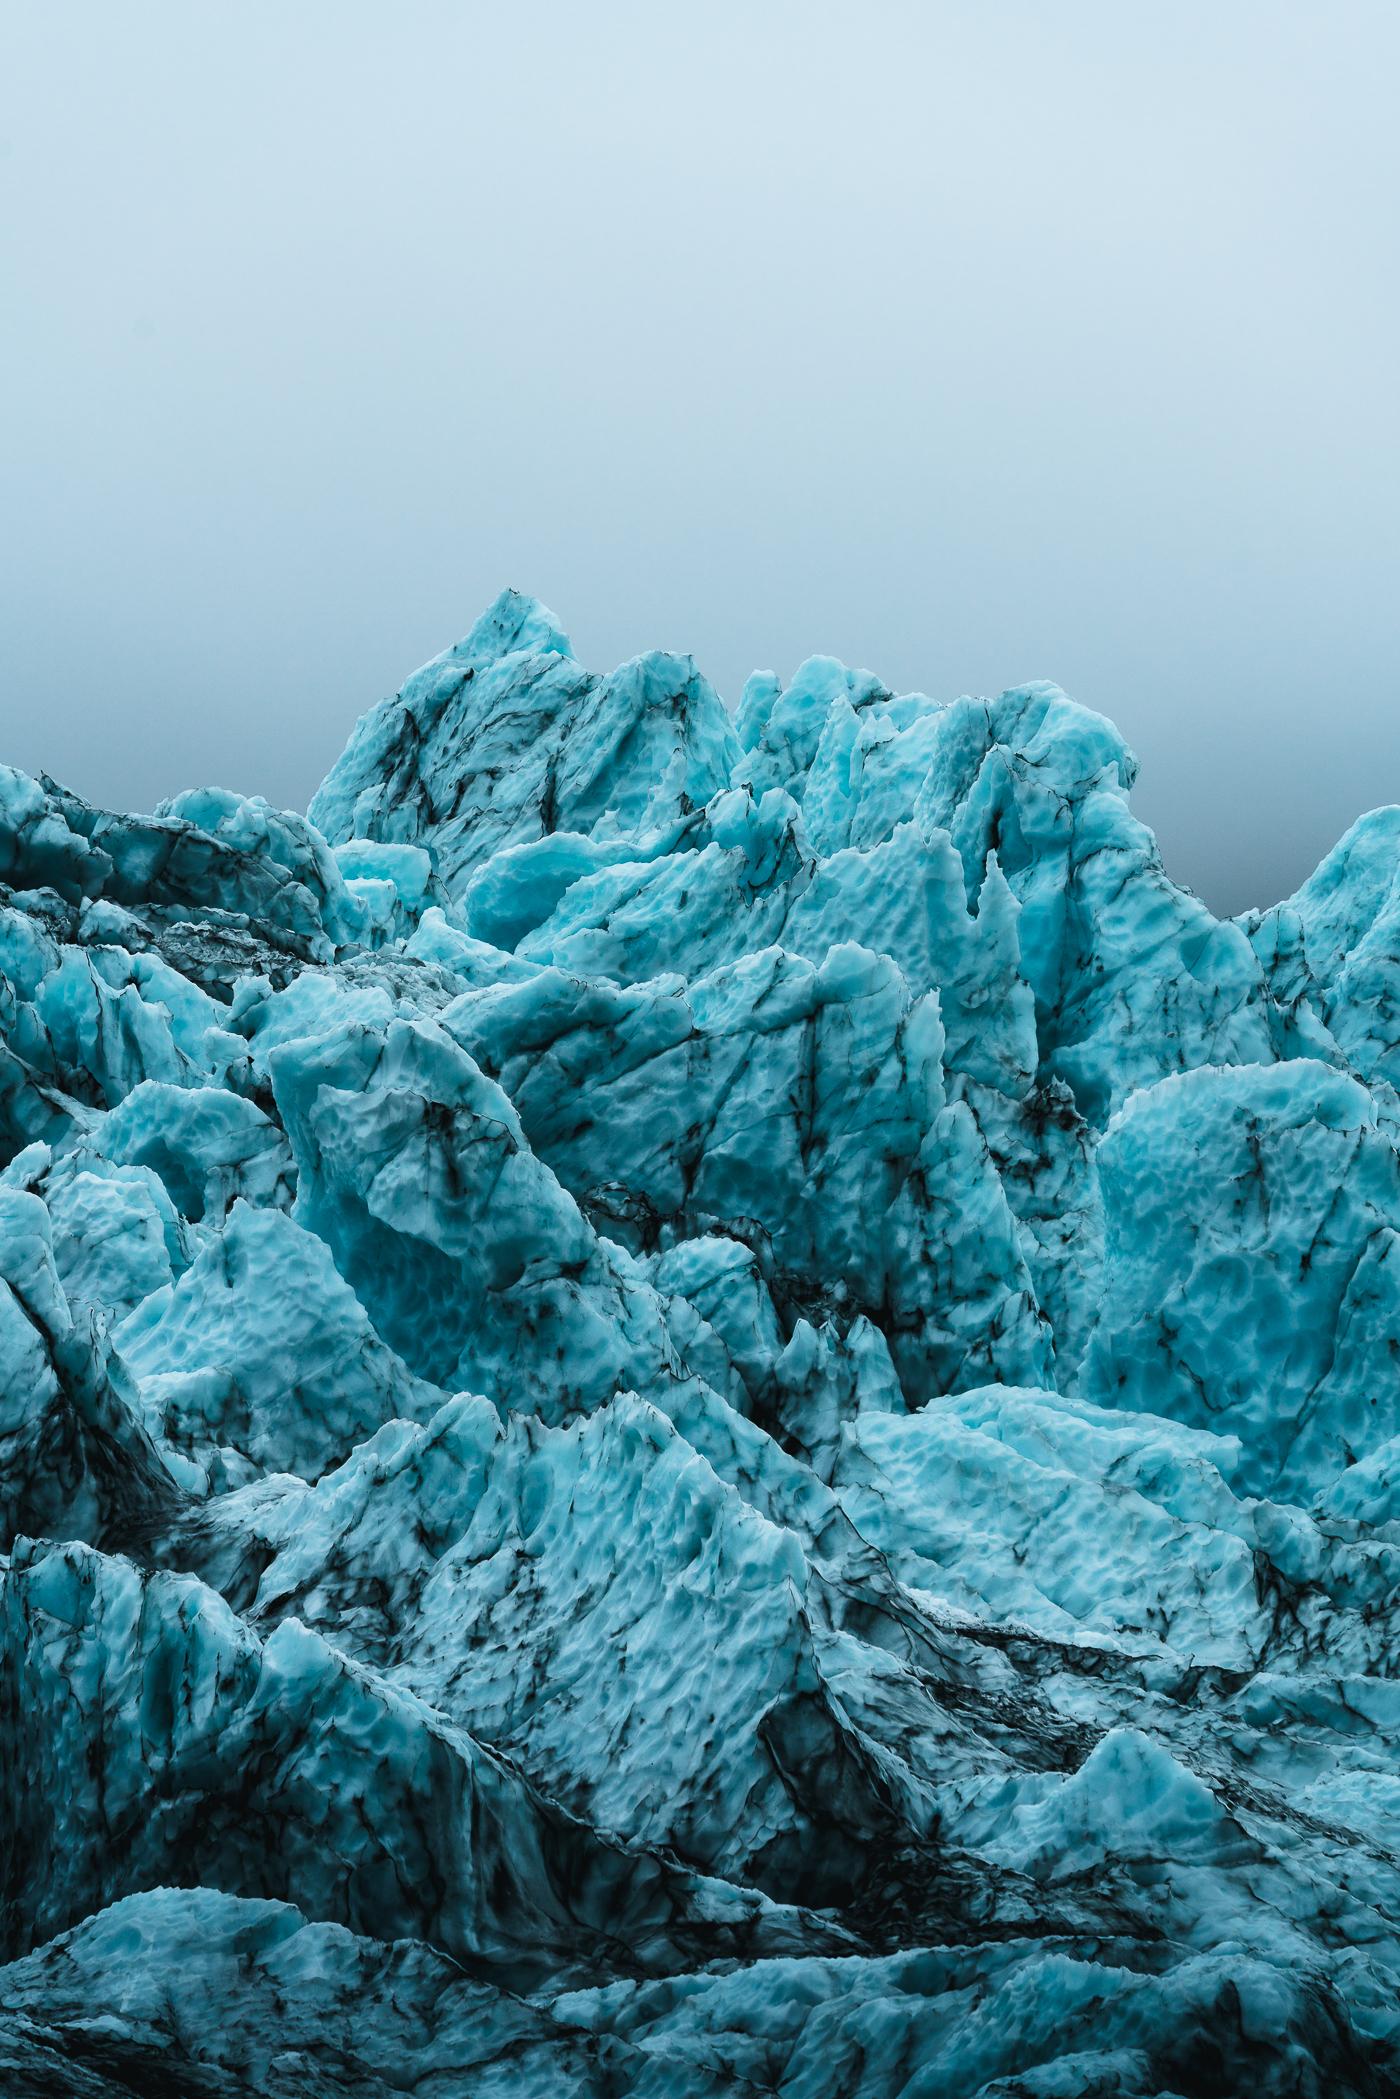 gabornagy_photography_iceland_glacier35.jpg